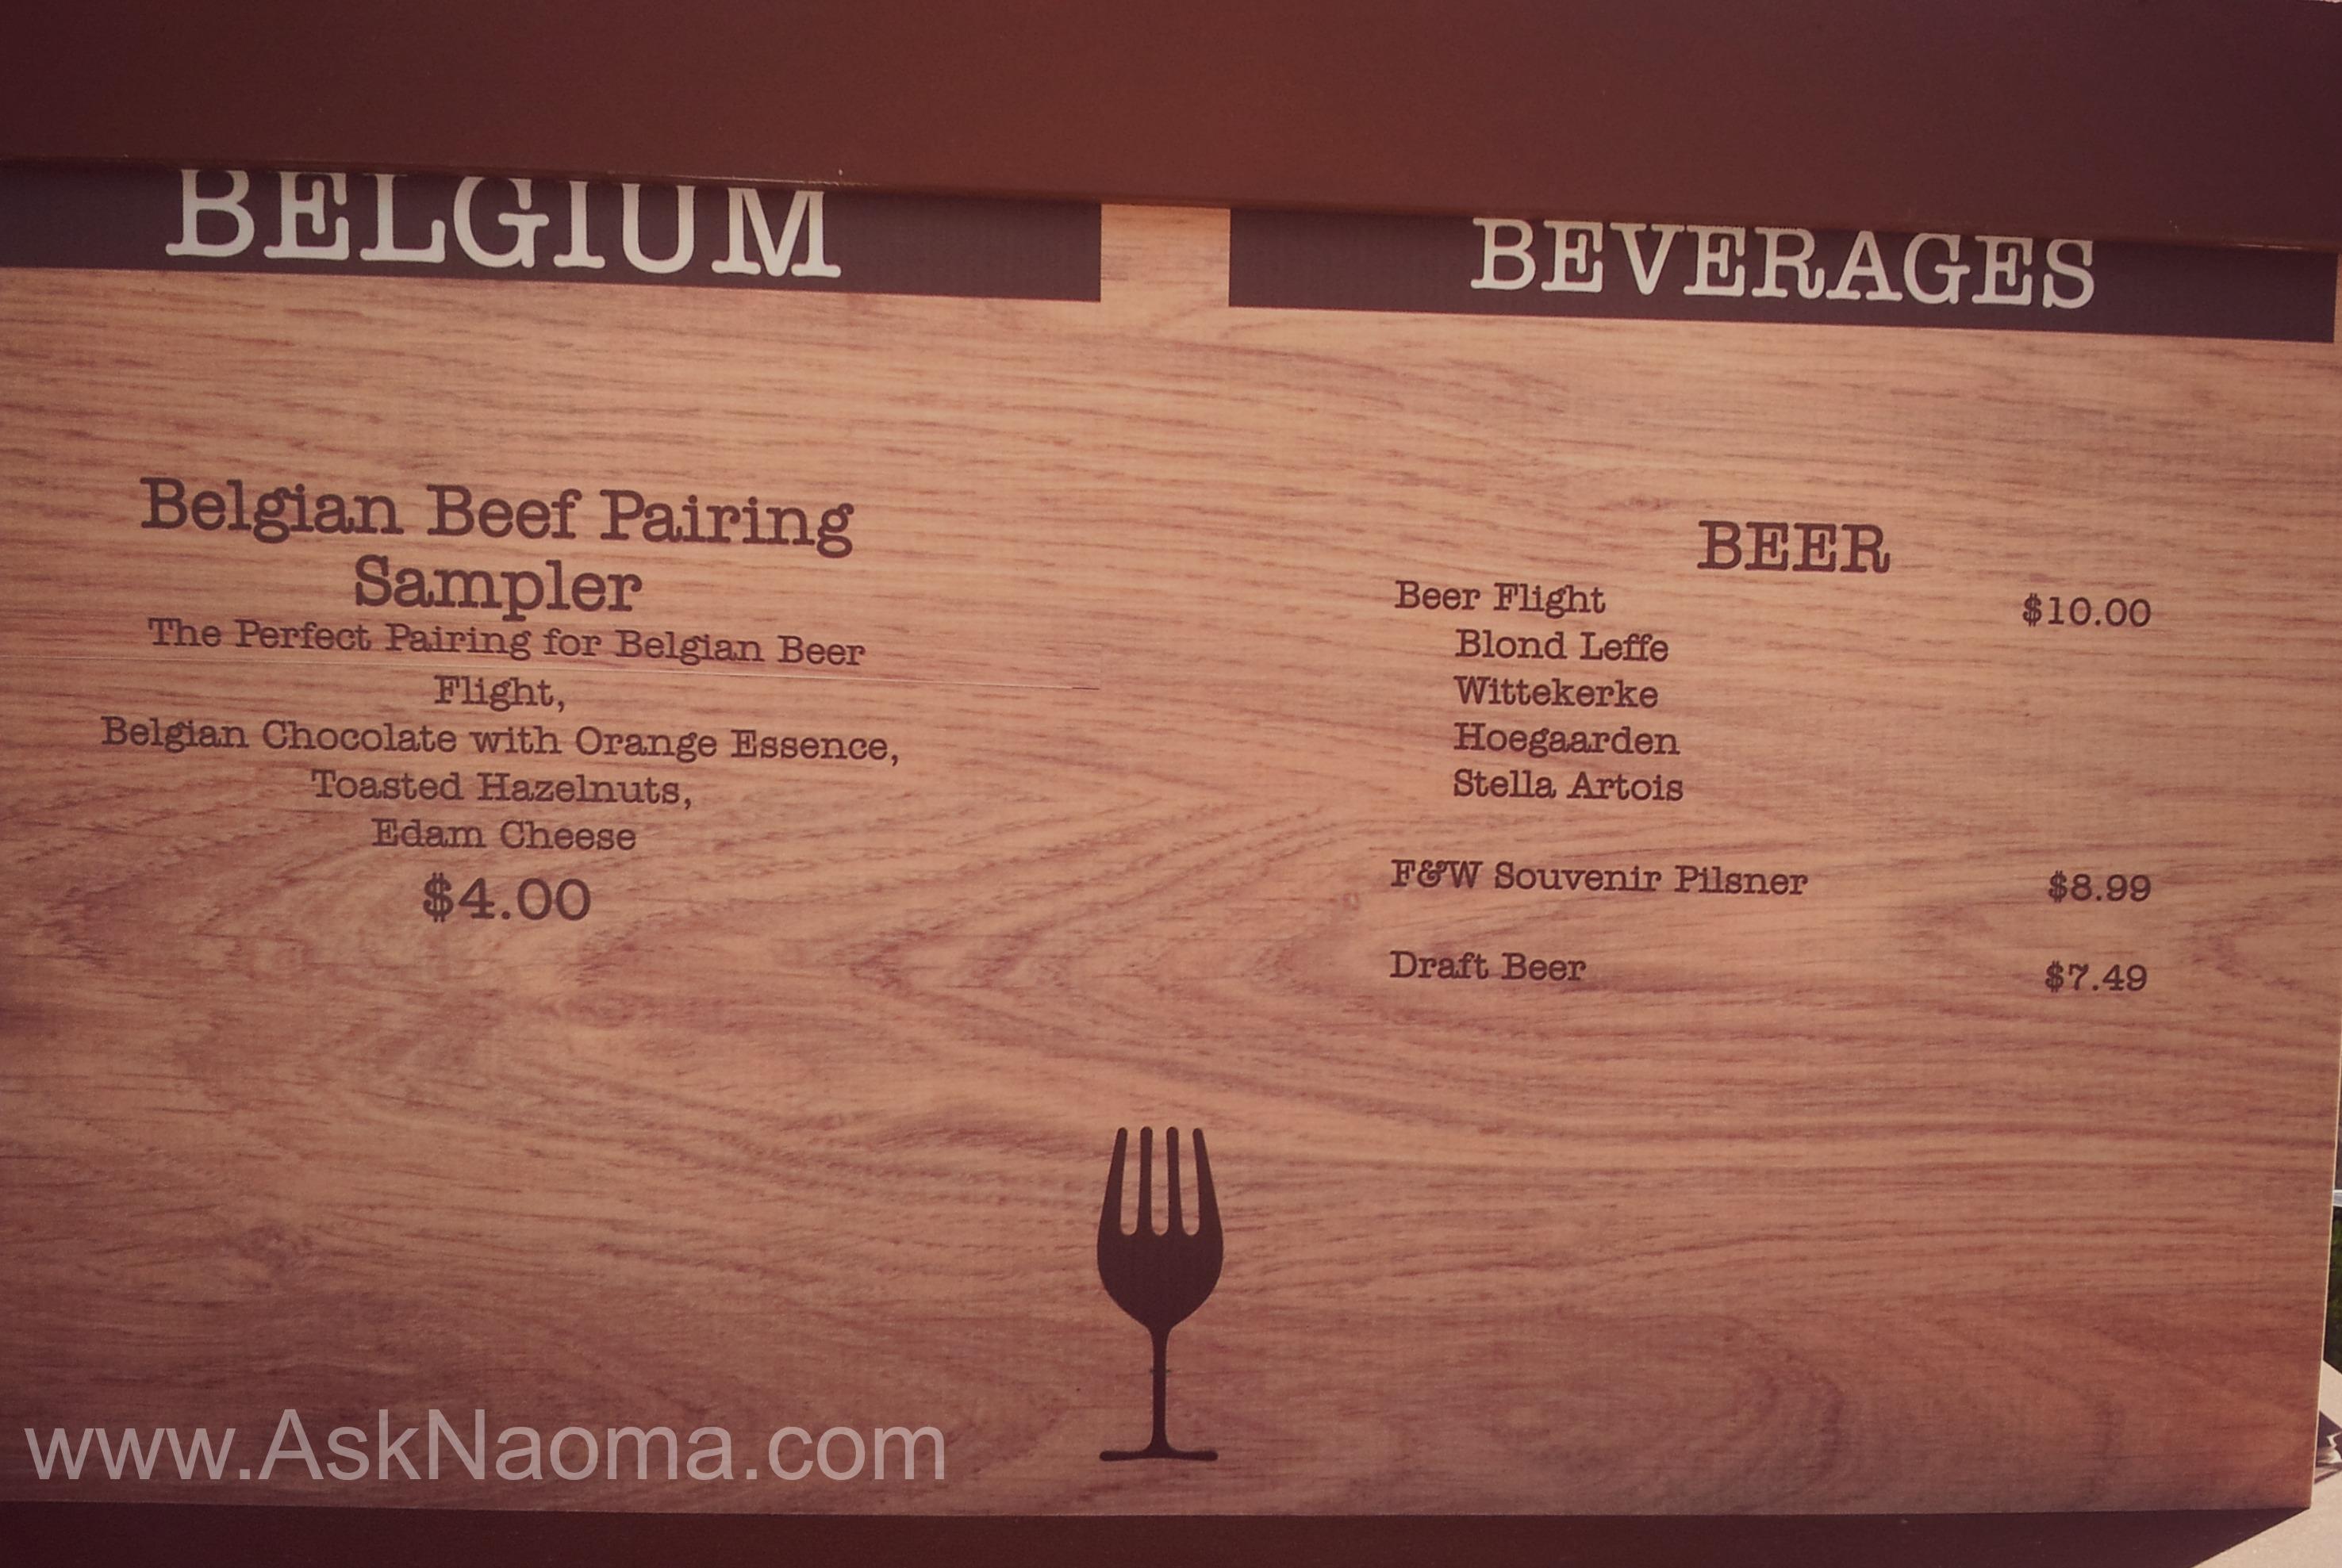 Busch Gardens Food & Wine Festival - Social Media Night - Ask Naoma